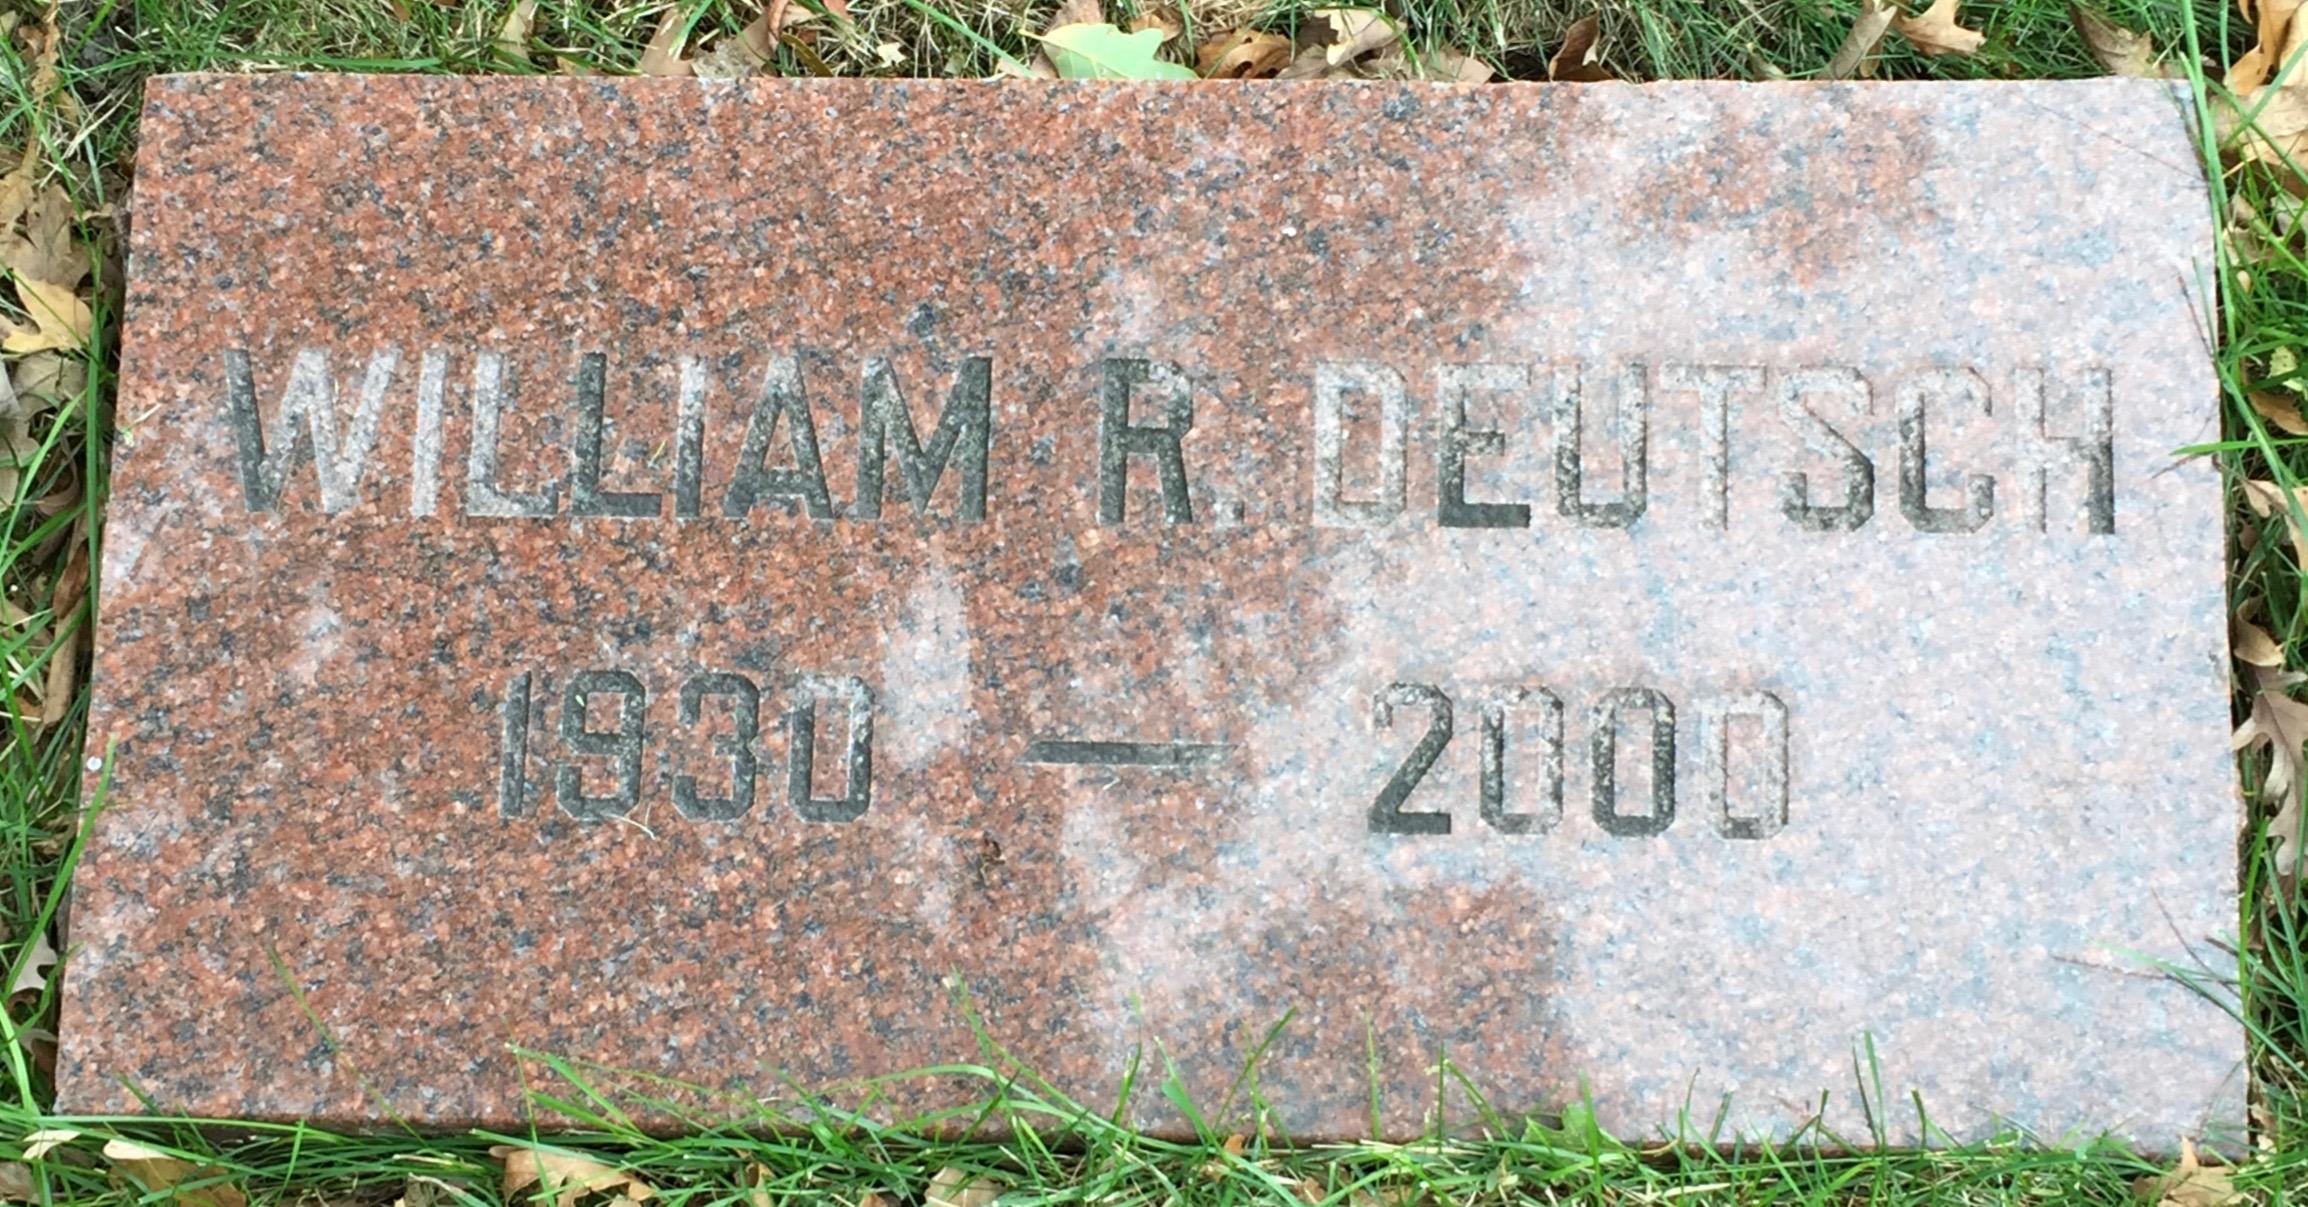 Rev William Robert Deutsch